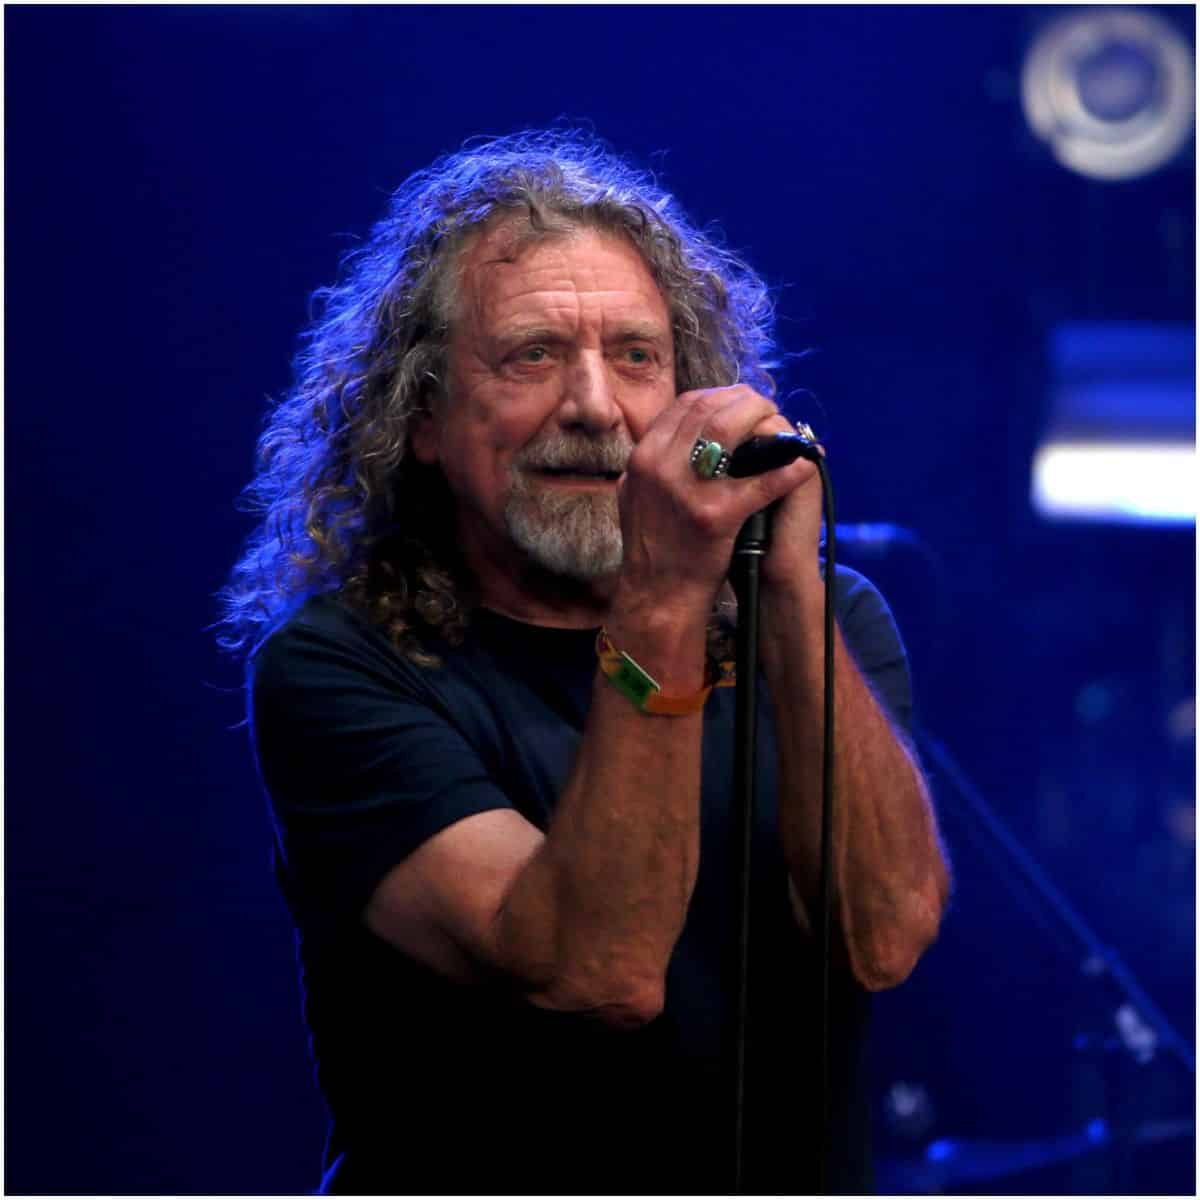 Robert Plant biography